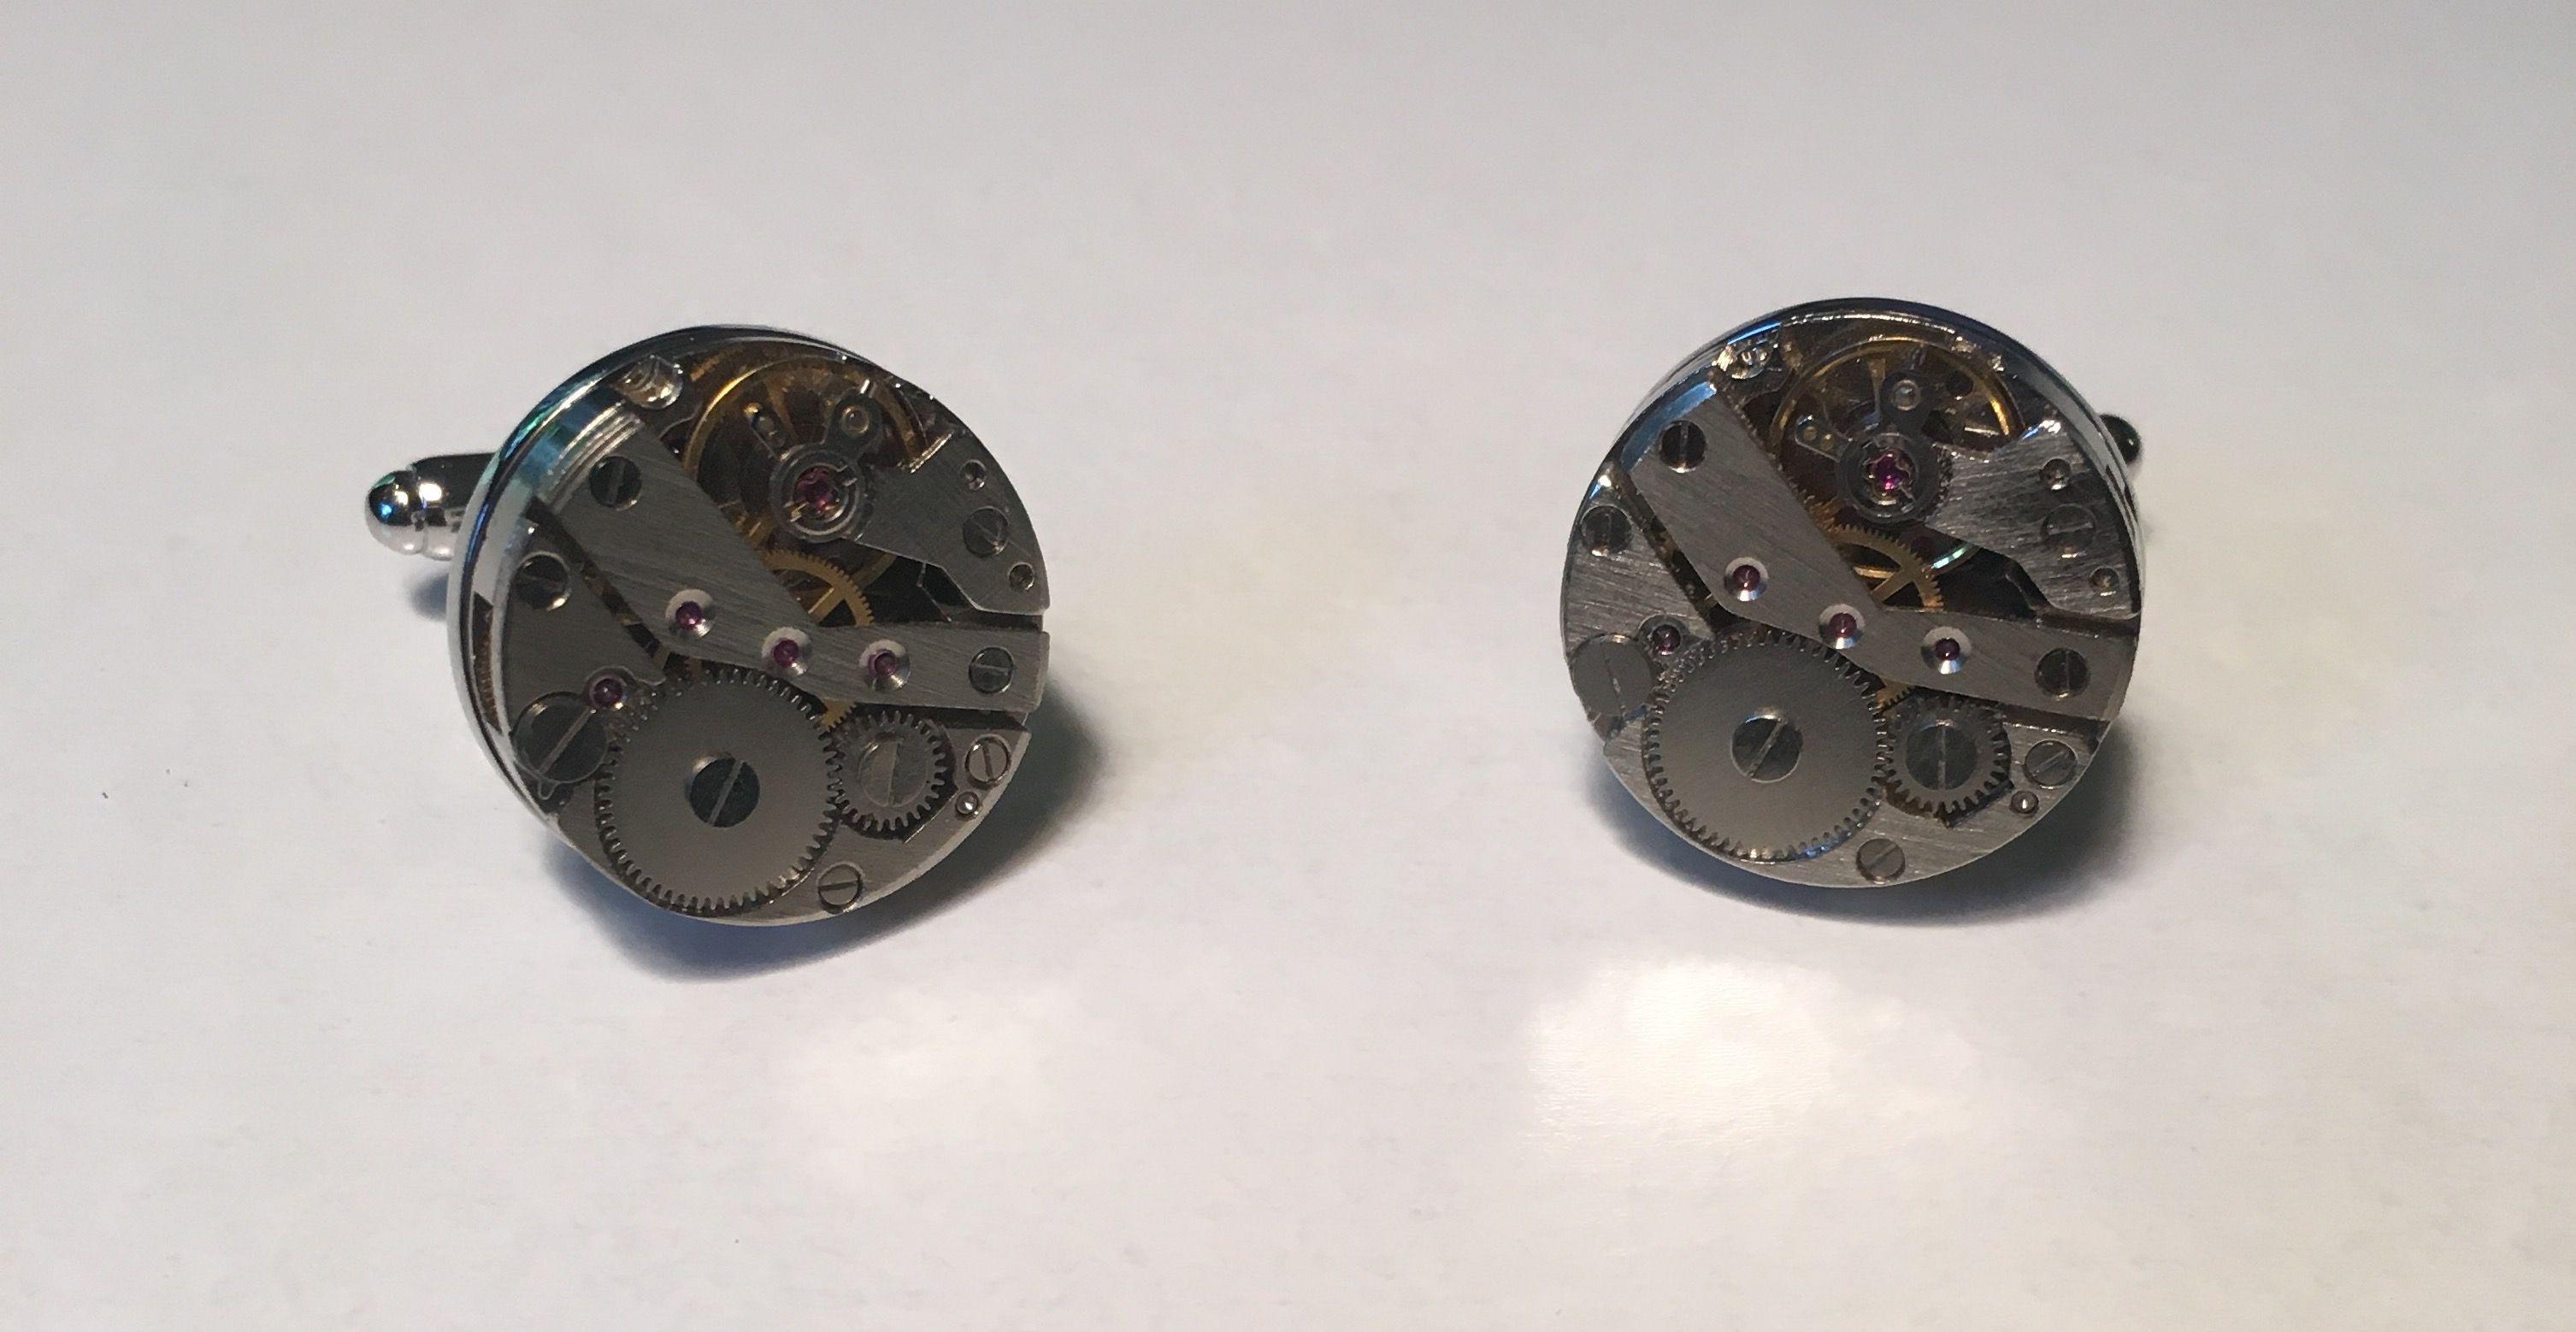 2 Pc. Crafty Inside of Mechanical Watch Moving Gear Savvy Cufflinks